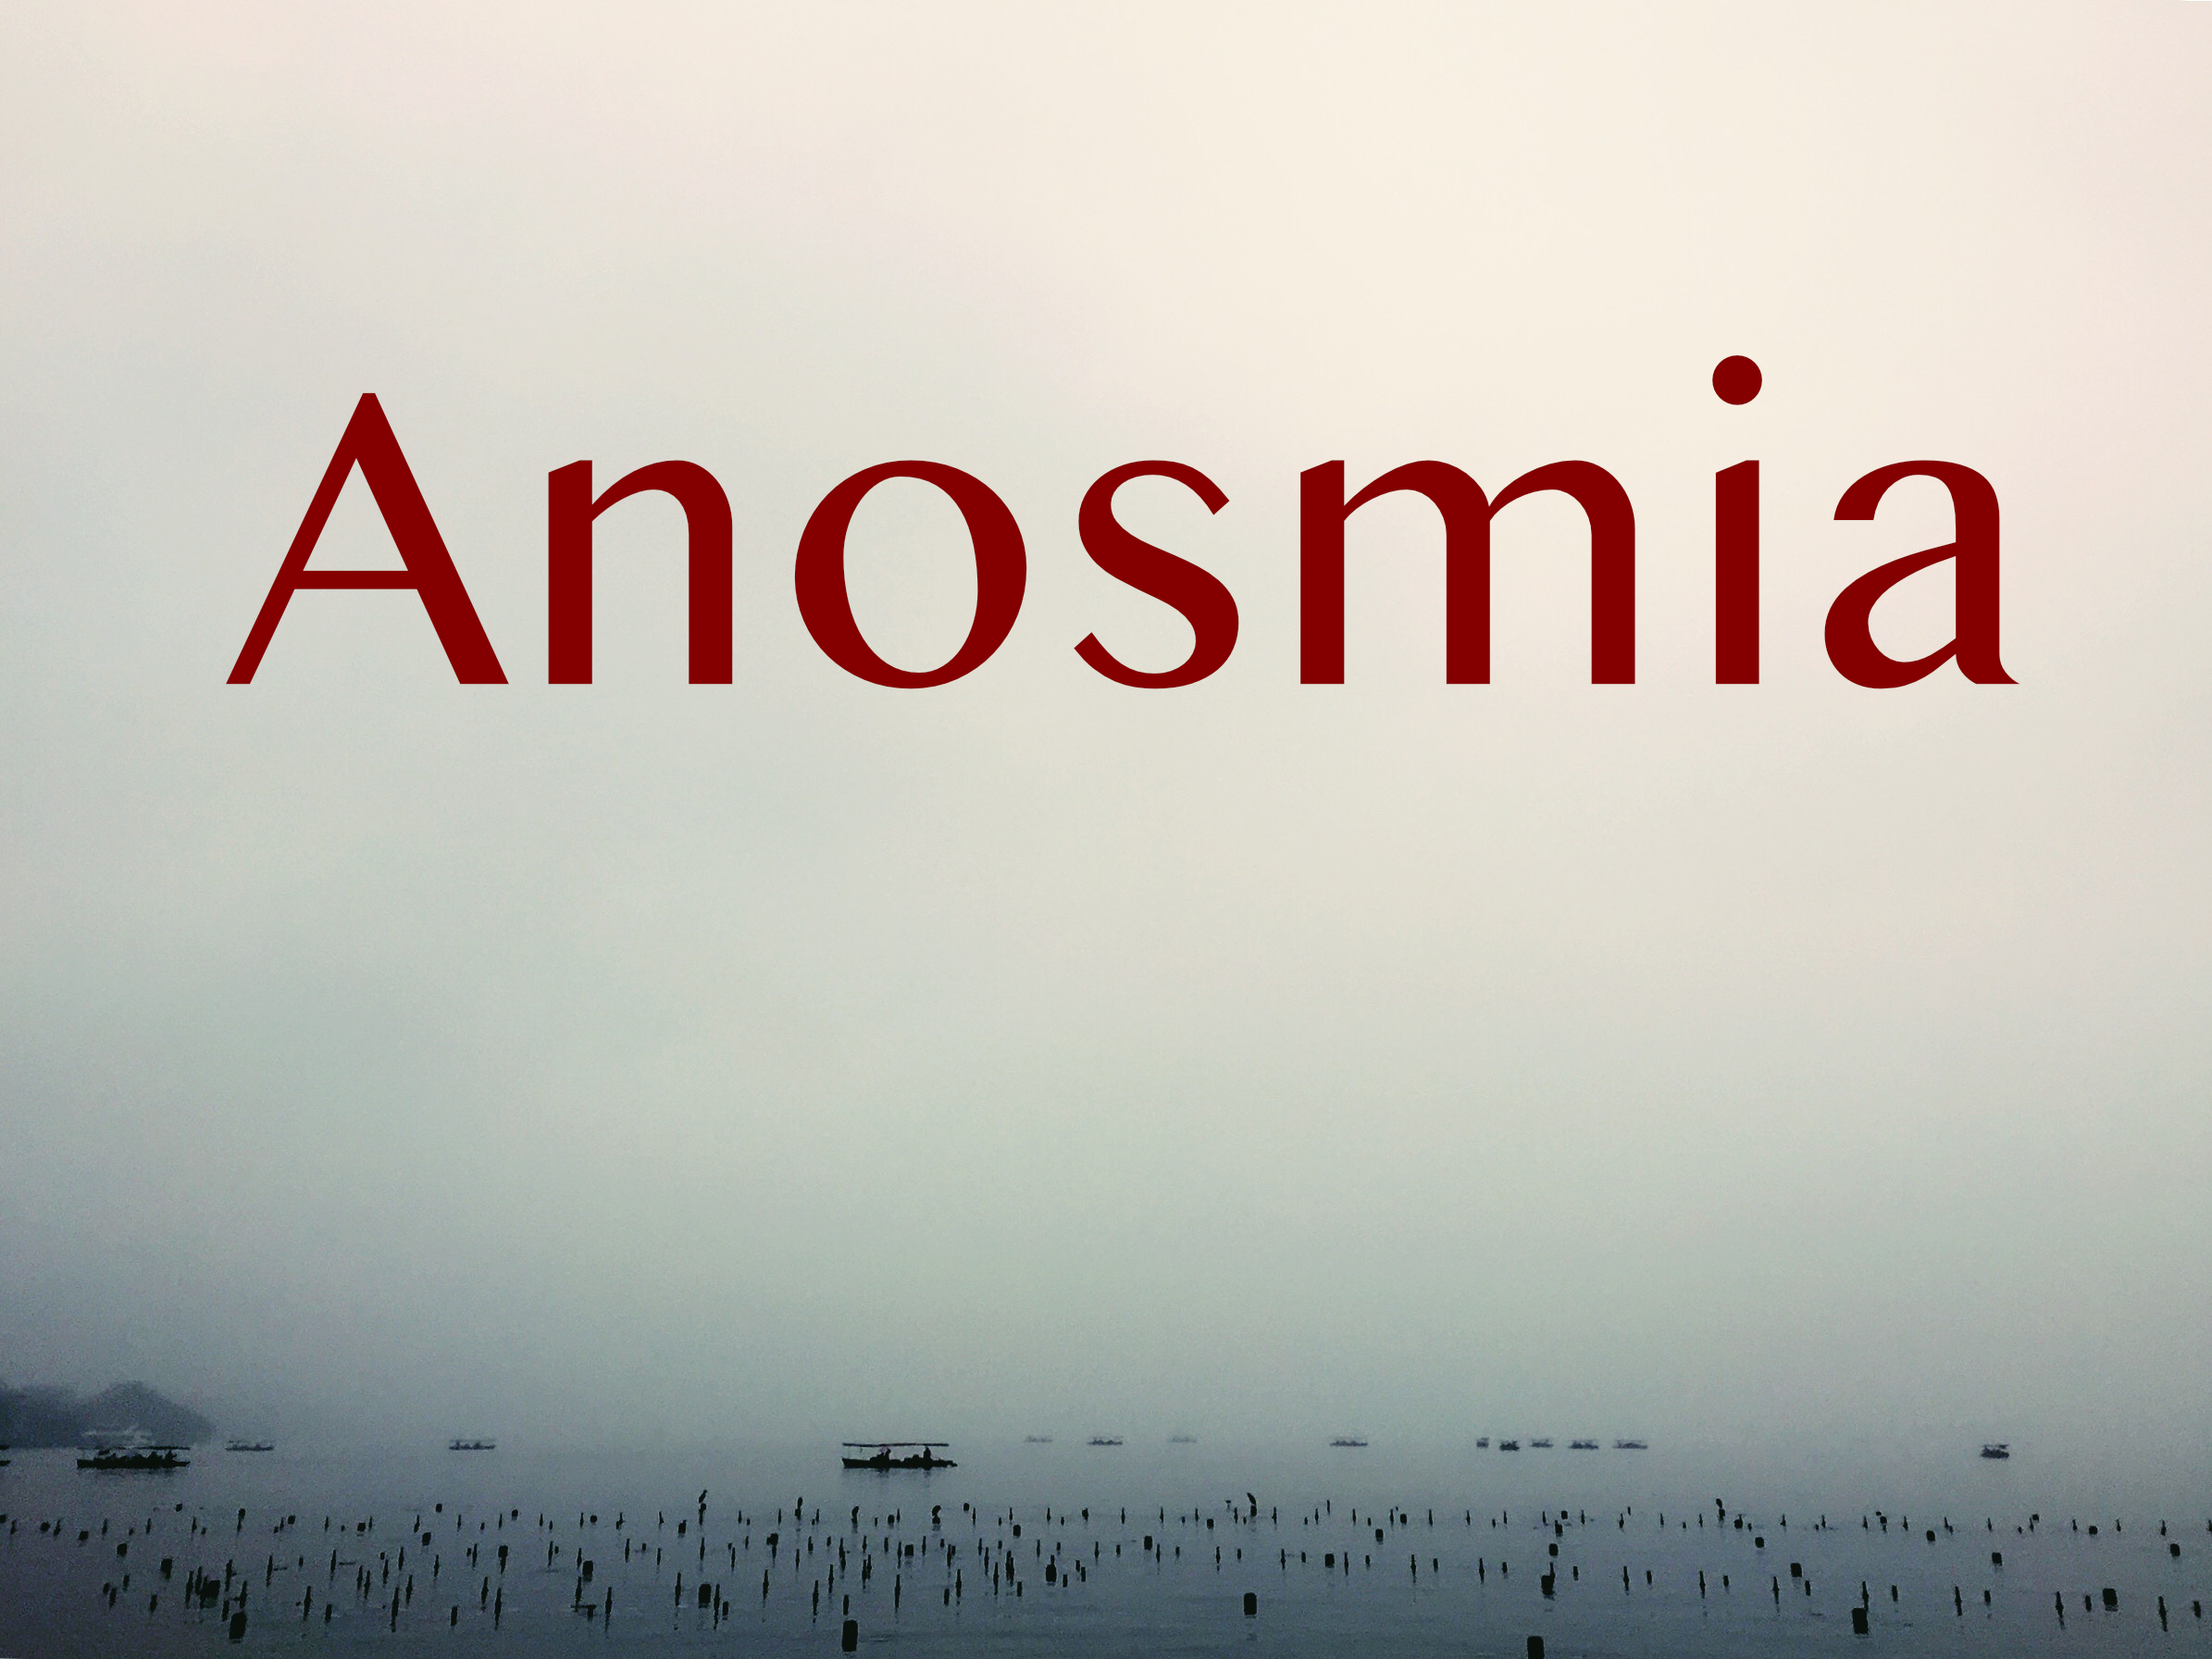 stanley-sivan-238676-unsplash_anosmia.jpg